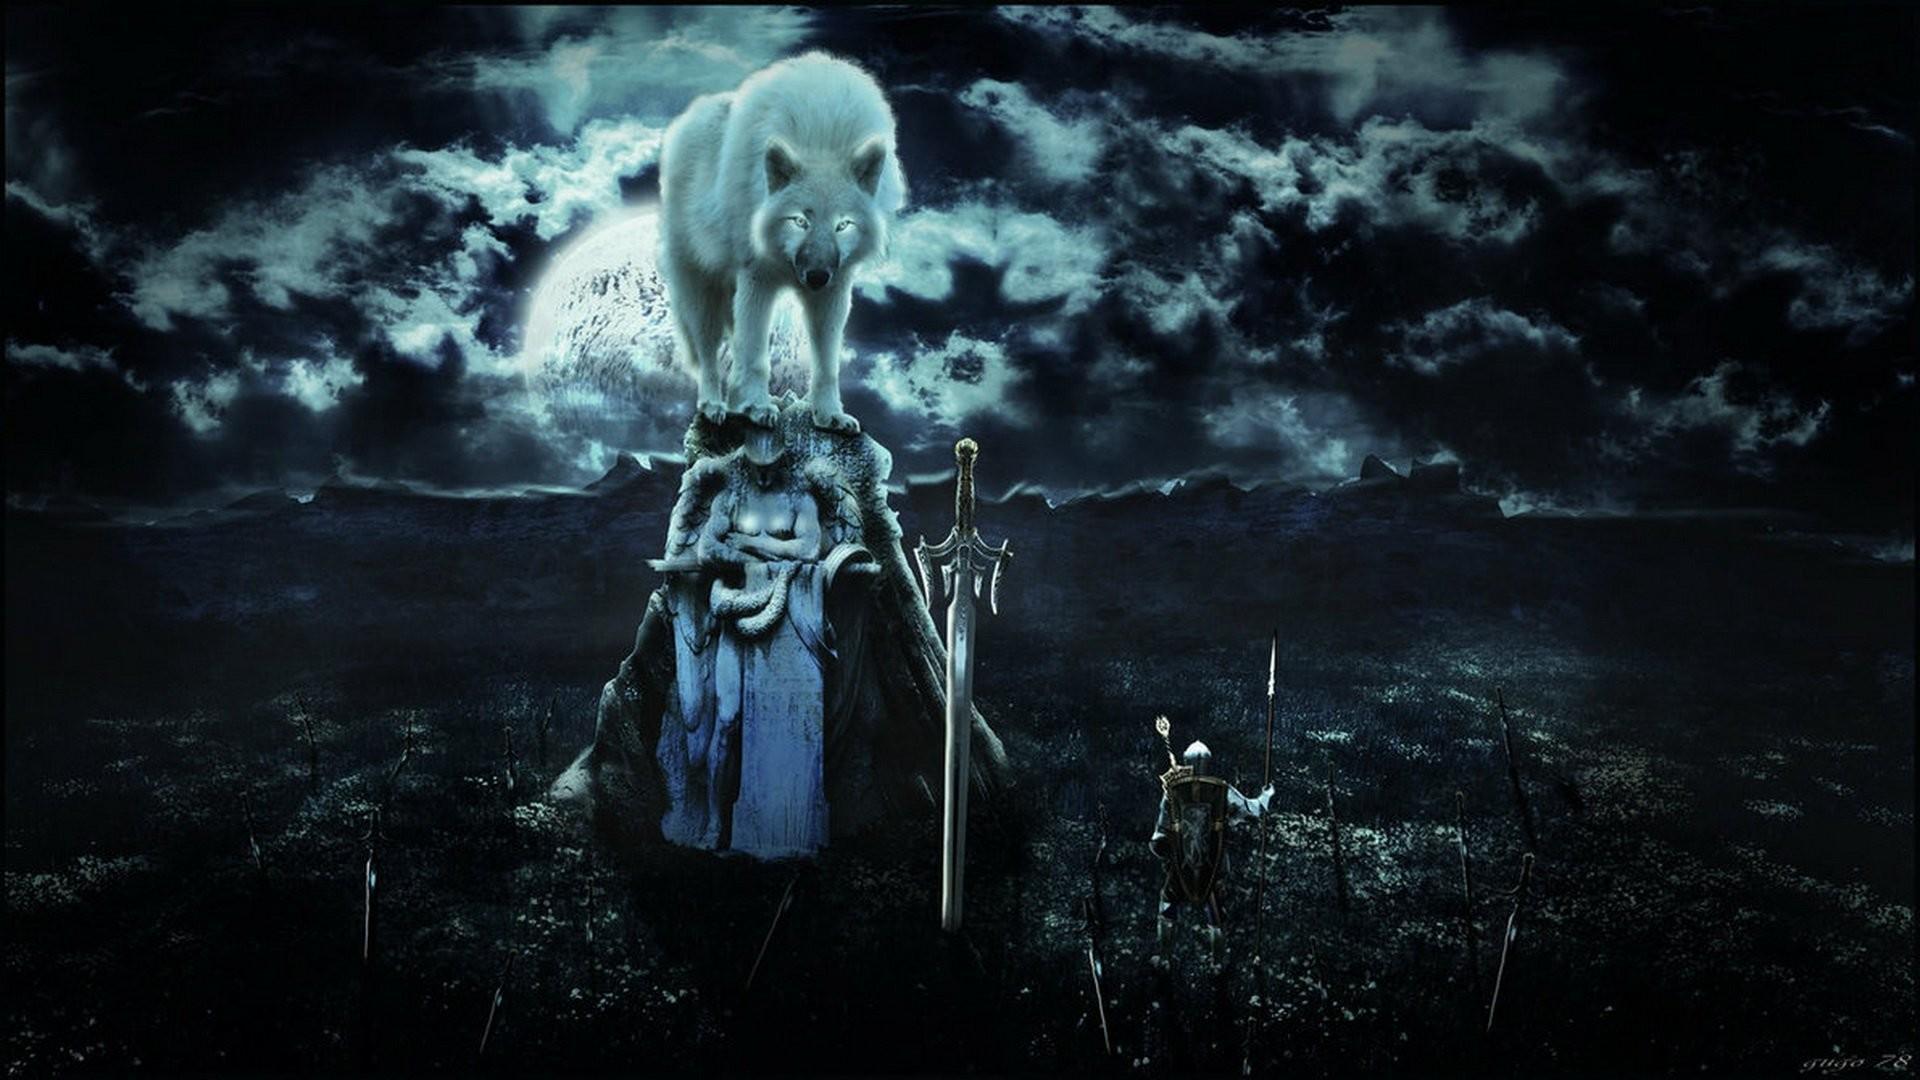 Dark Souls Wallpaper 1920x1080 57 Images